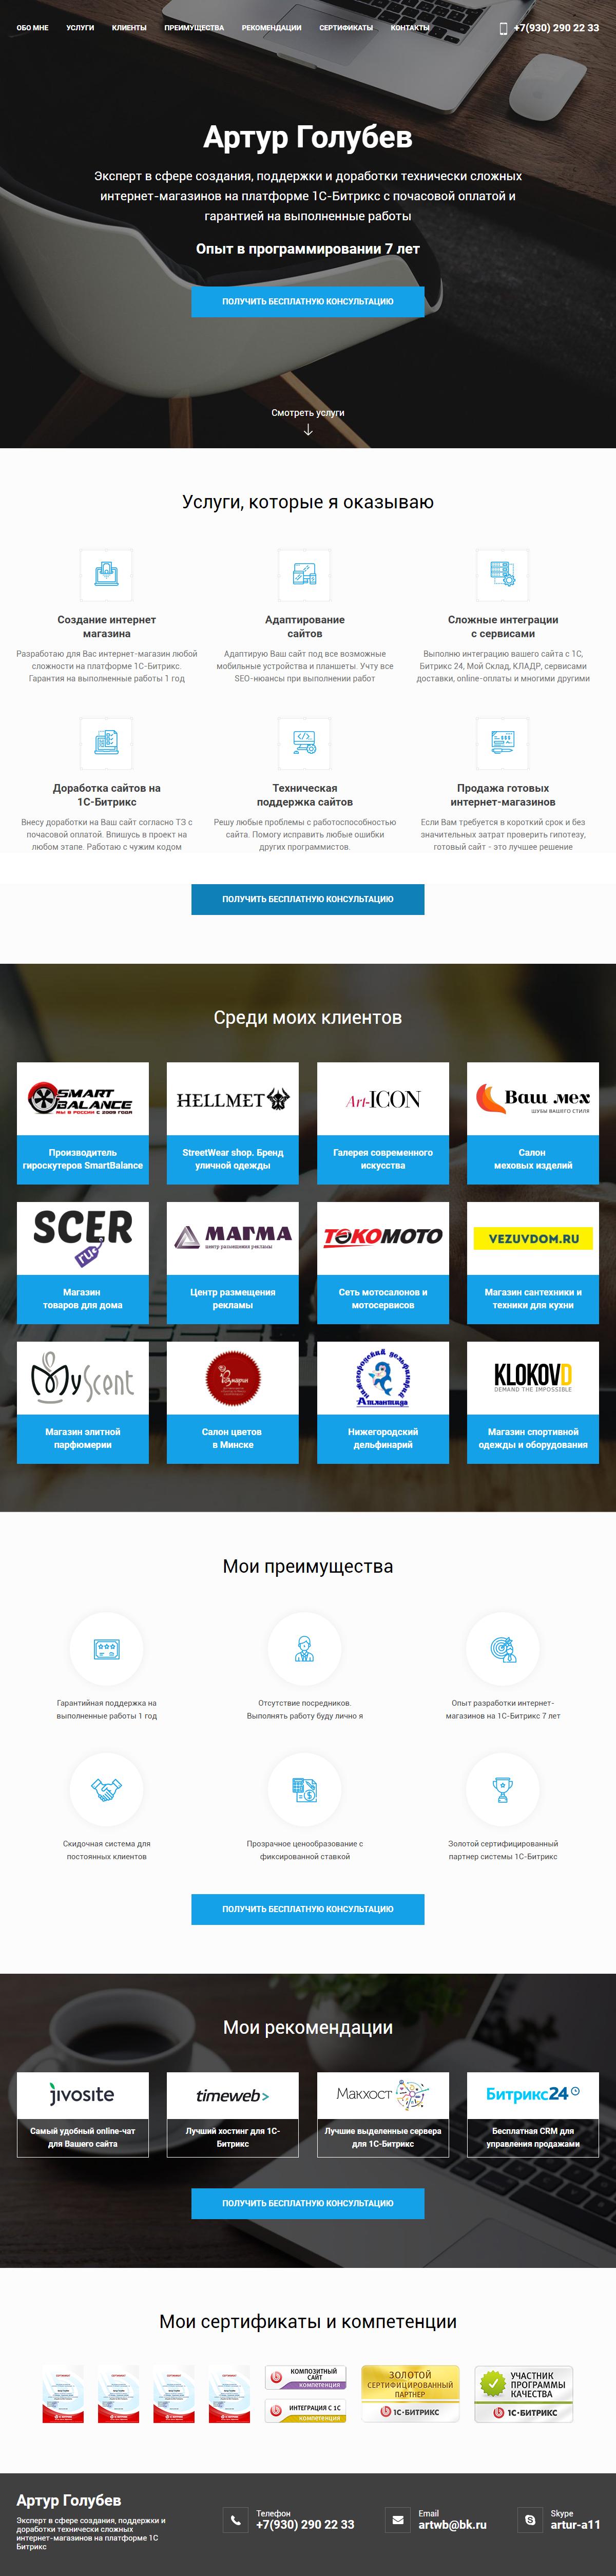 Сайт-визитка программиста Артура Голубева